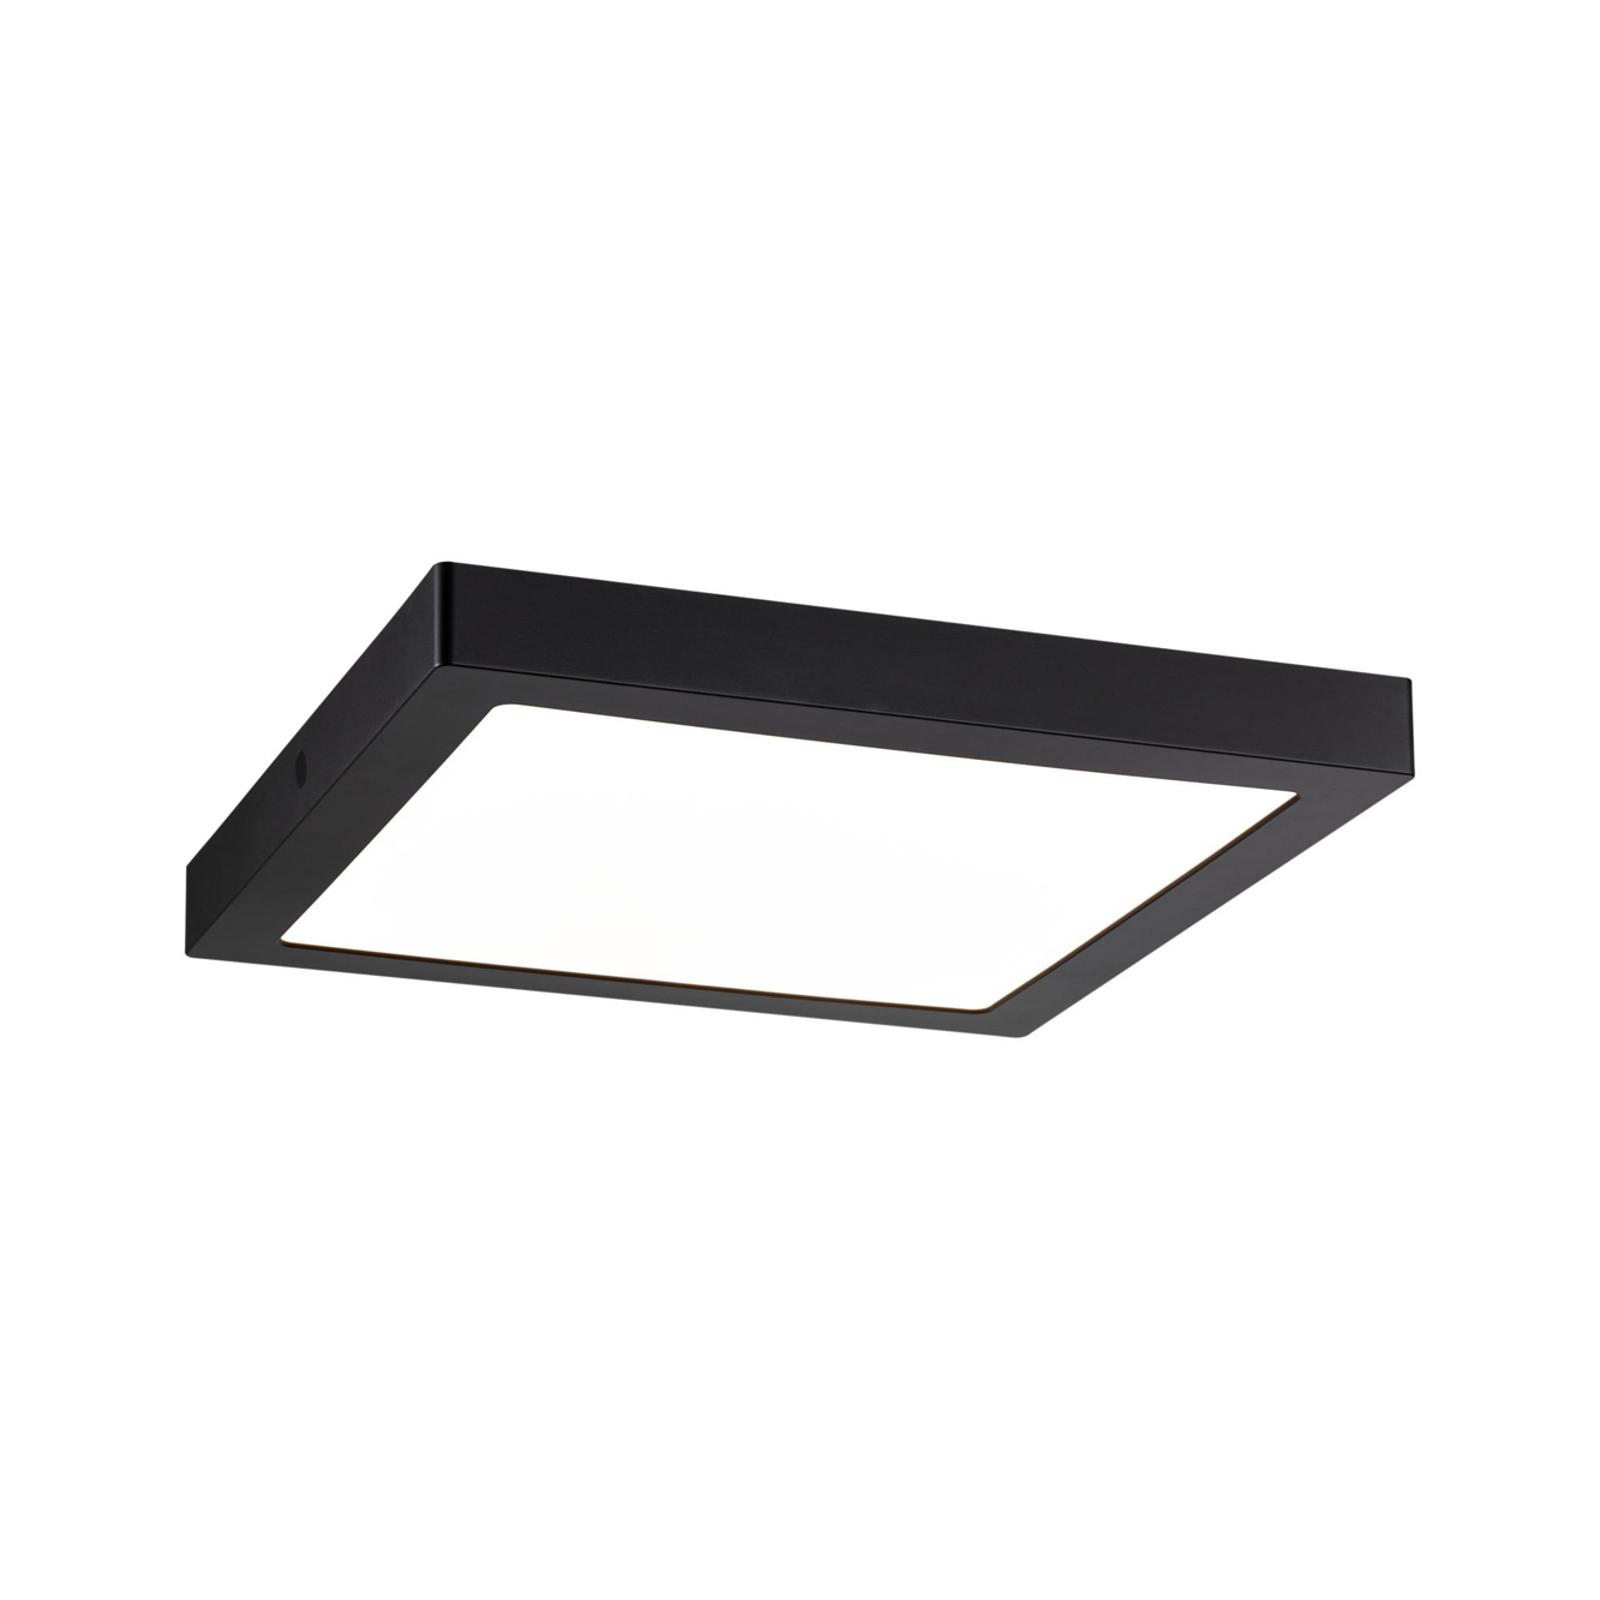 Paulmann Abia panneau LED angulaire, noir mat